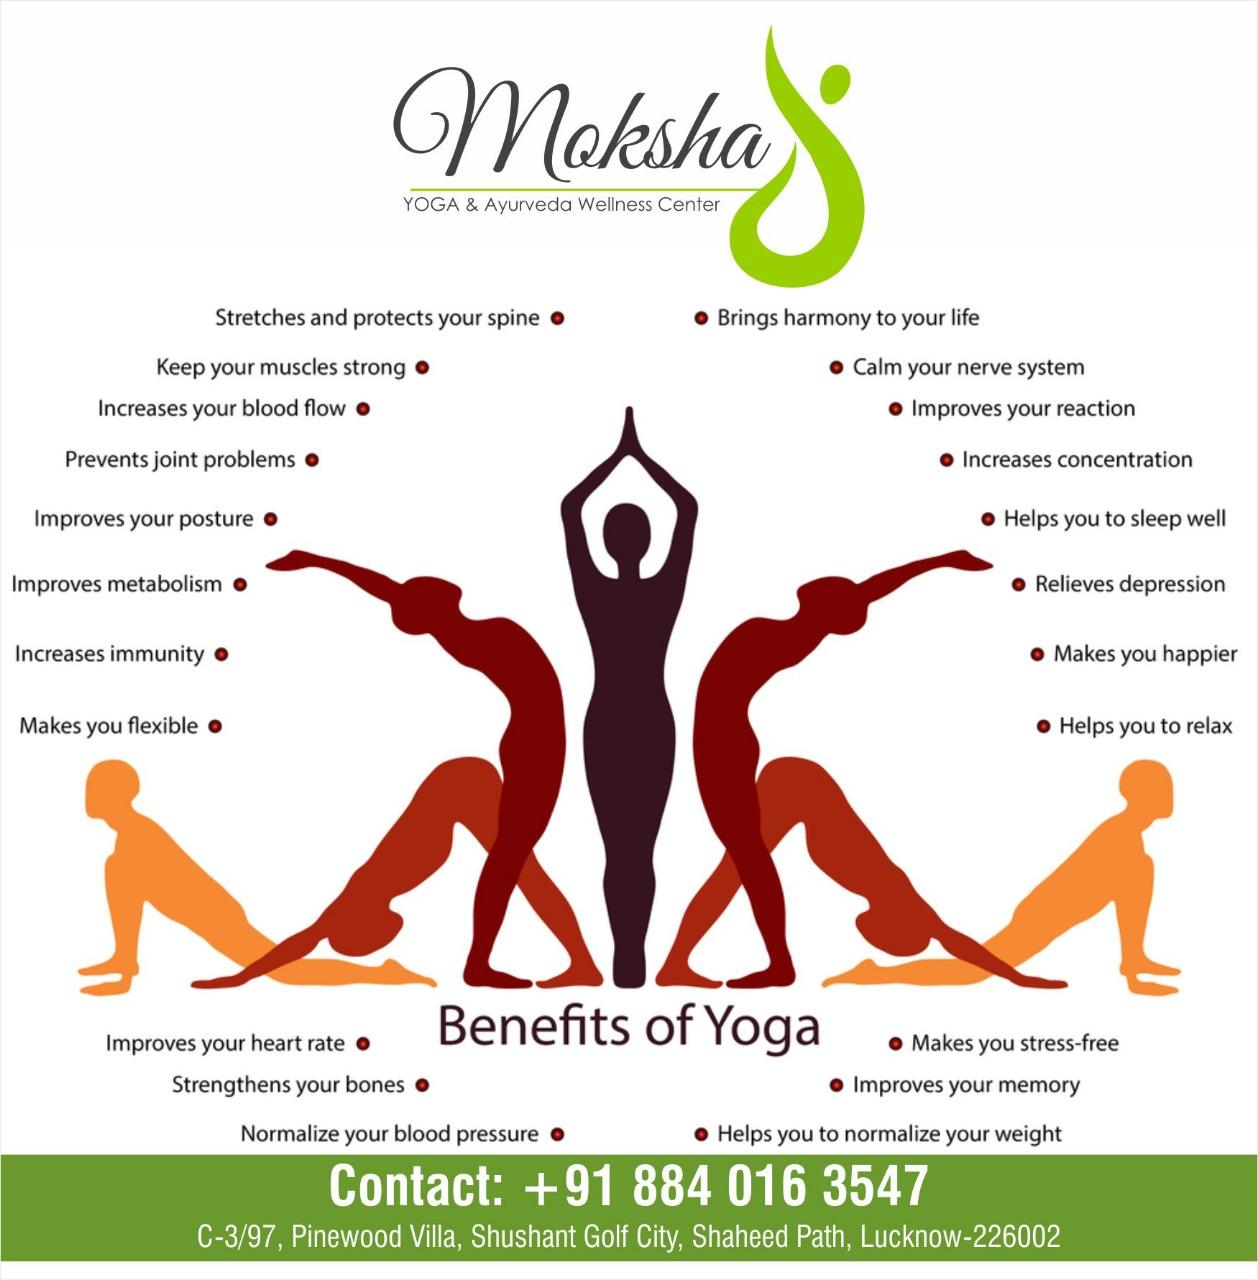 Moksha Yoga & Ayurveda Wellness Center in Devariya, Lucknow